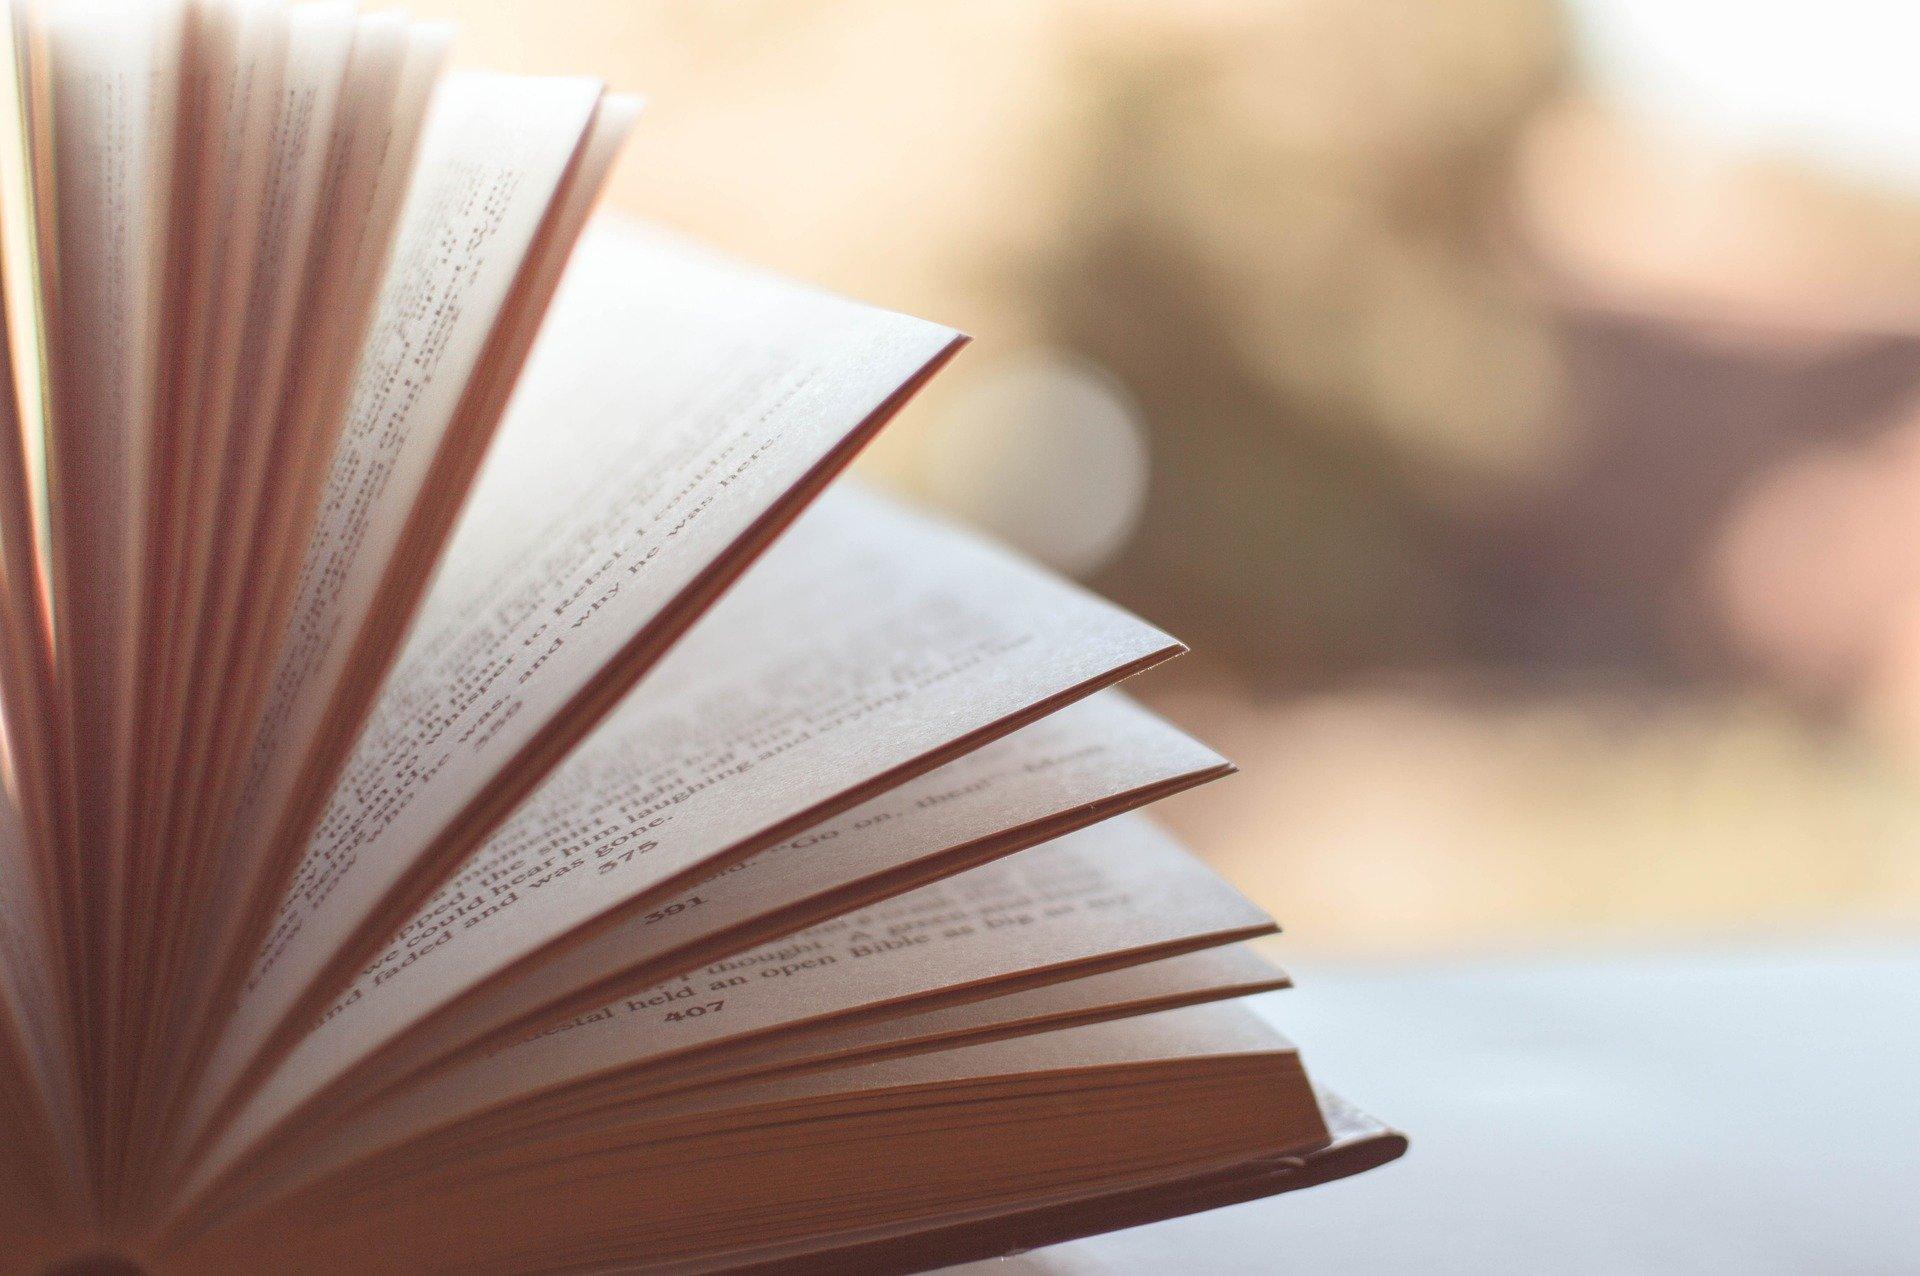 Libri da leggere in quarantena